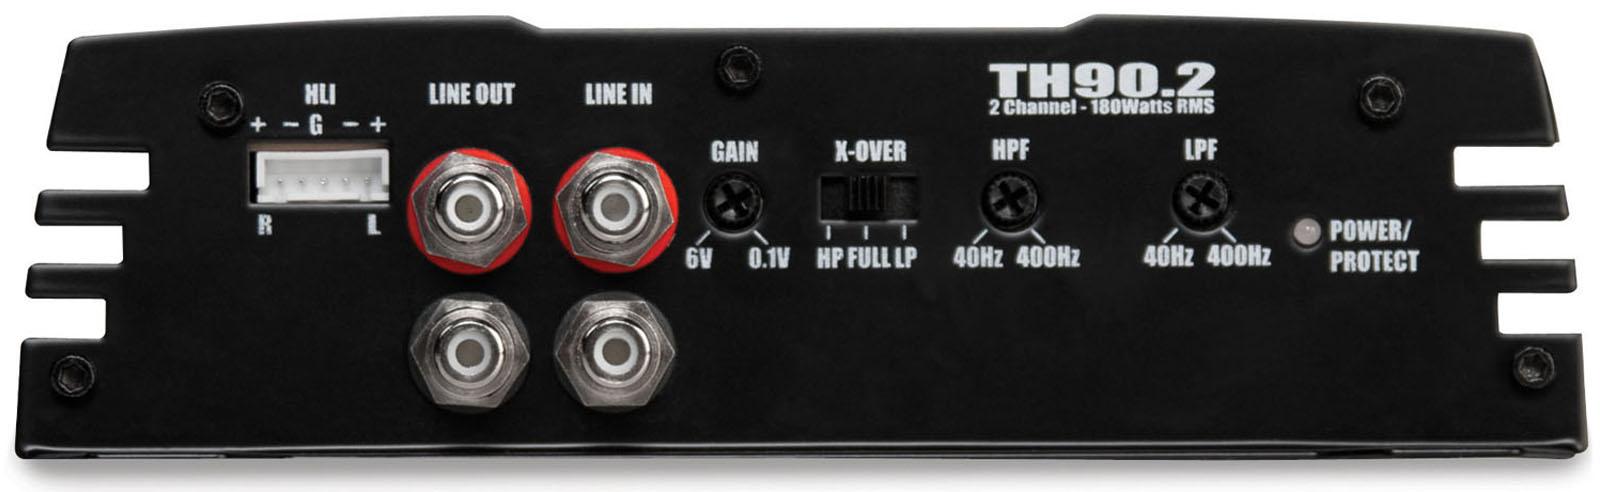 89 2 Channel Amplifier With Dual Electronics Xpr82d 1 High 000watt 24volt Truck Bus Rv Bridgeable Mosfet Th902 Th Series 360 Watt Rms Class Ab